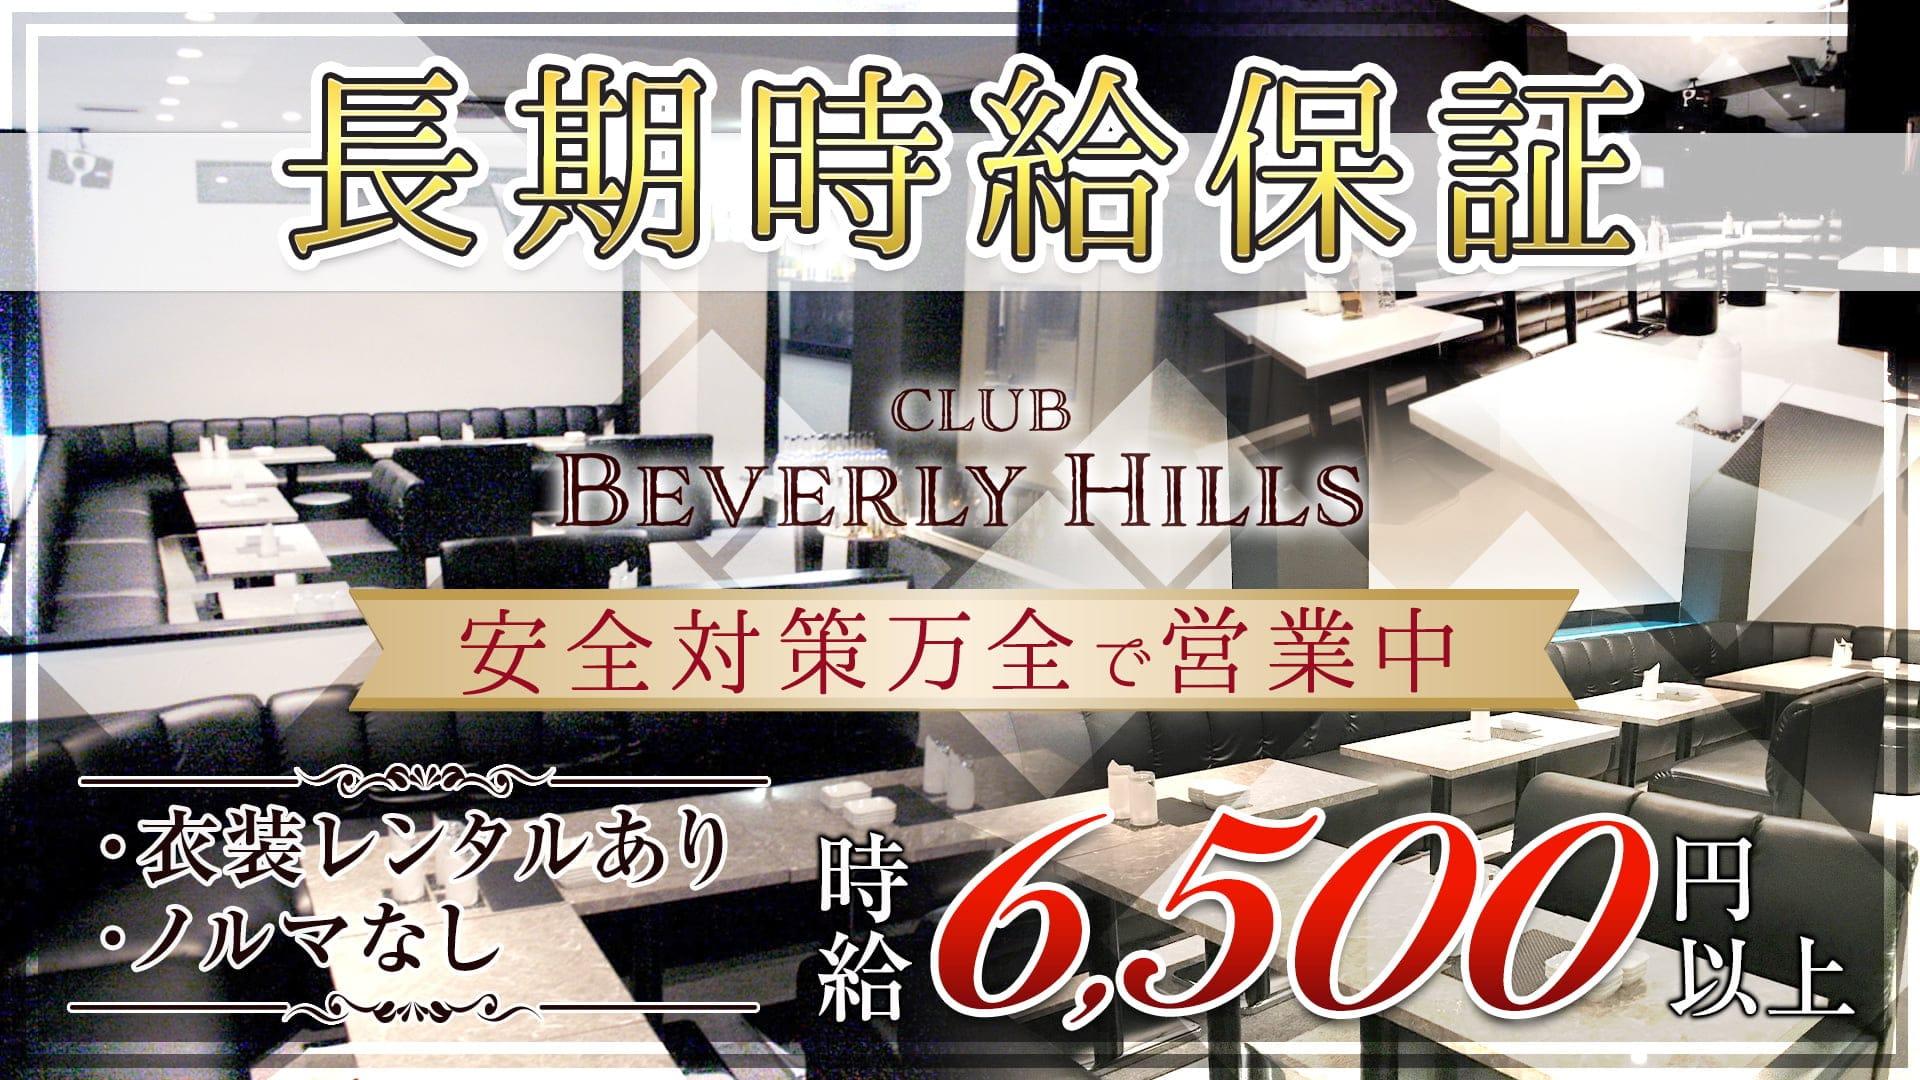 Beverly Hills(ビバリーヒルズ)【公式求人・体入情報】 川越キャバクラ TOP画像